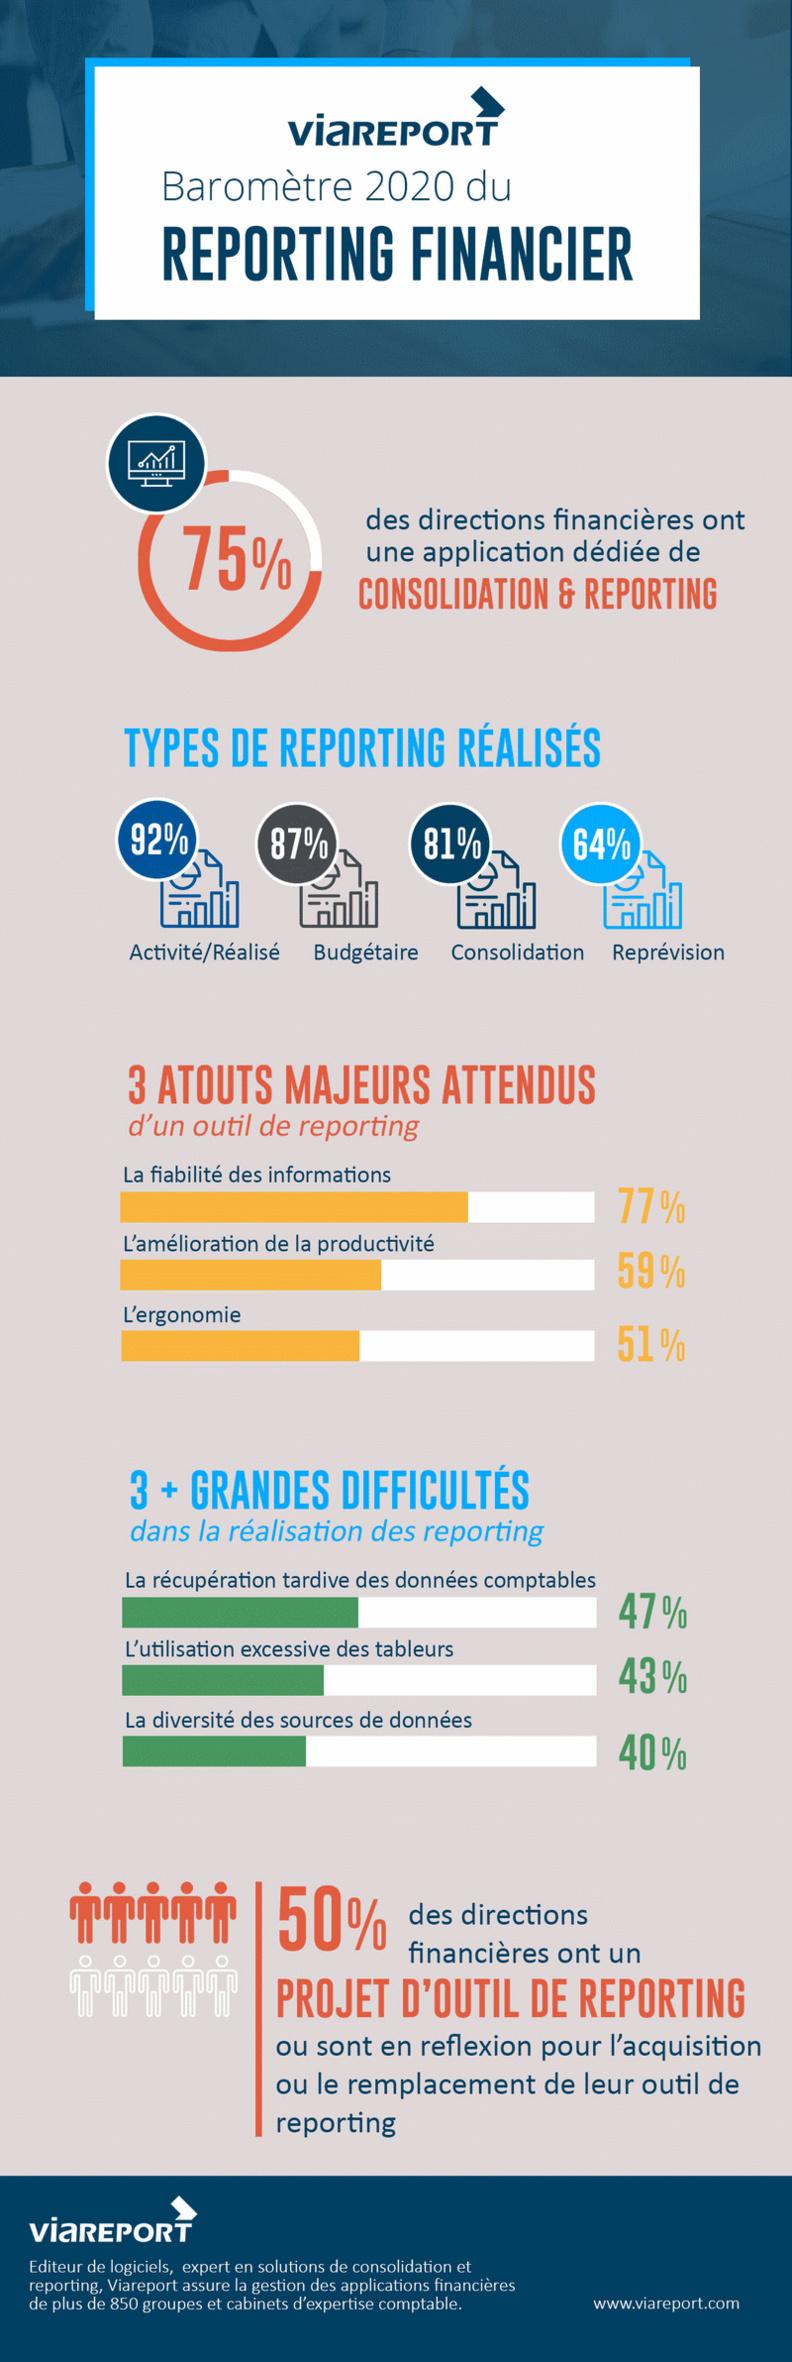 Viareport : premier baromètre du reporting financier